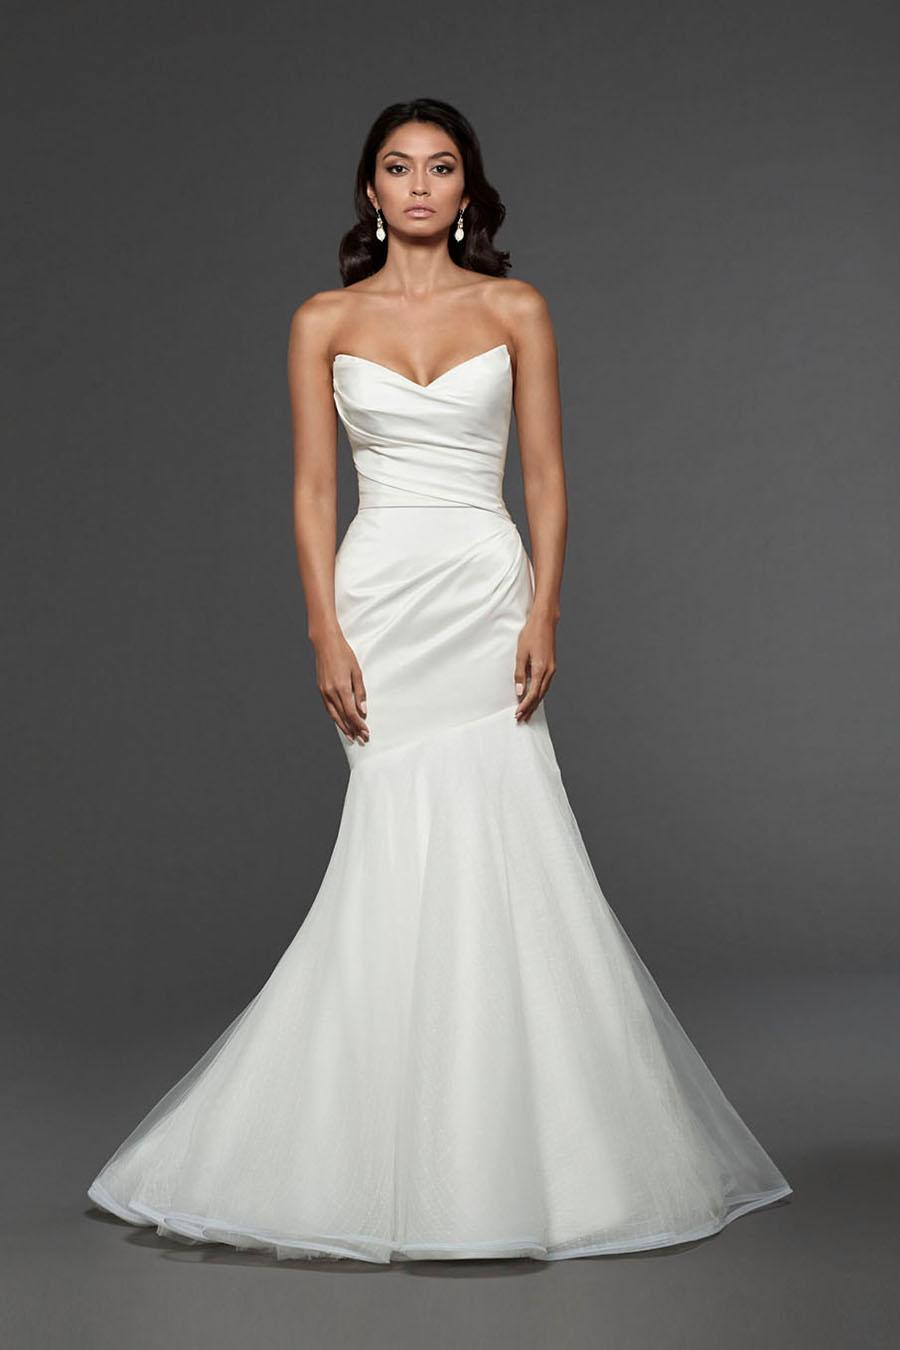 Nena by Matthew Christopher - Silk Taffeta and Tulle Mermaid Wedding Dress